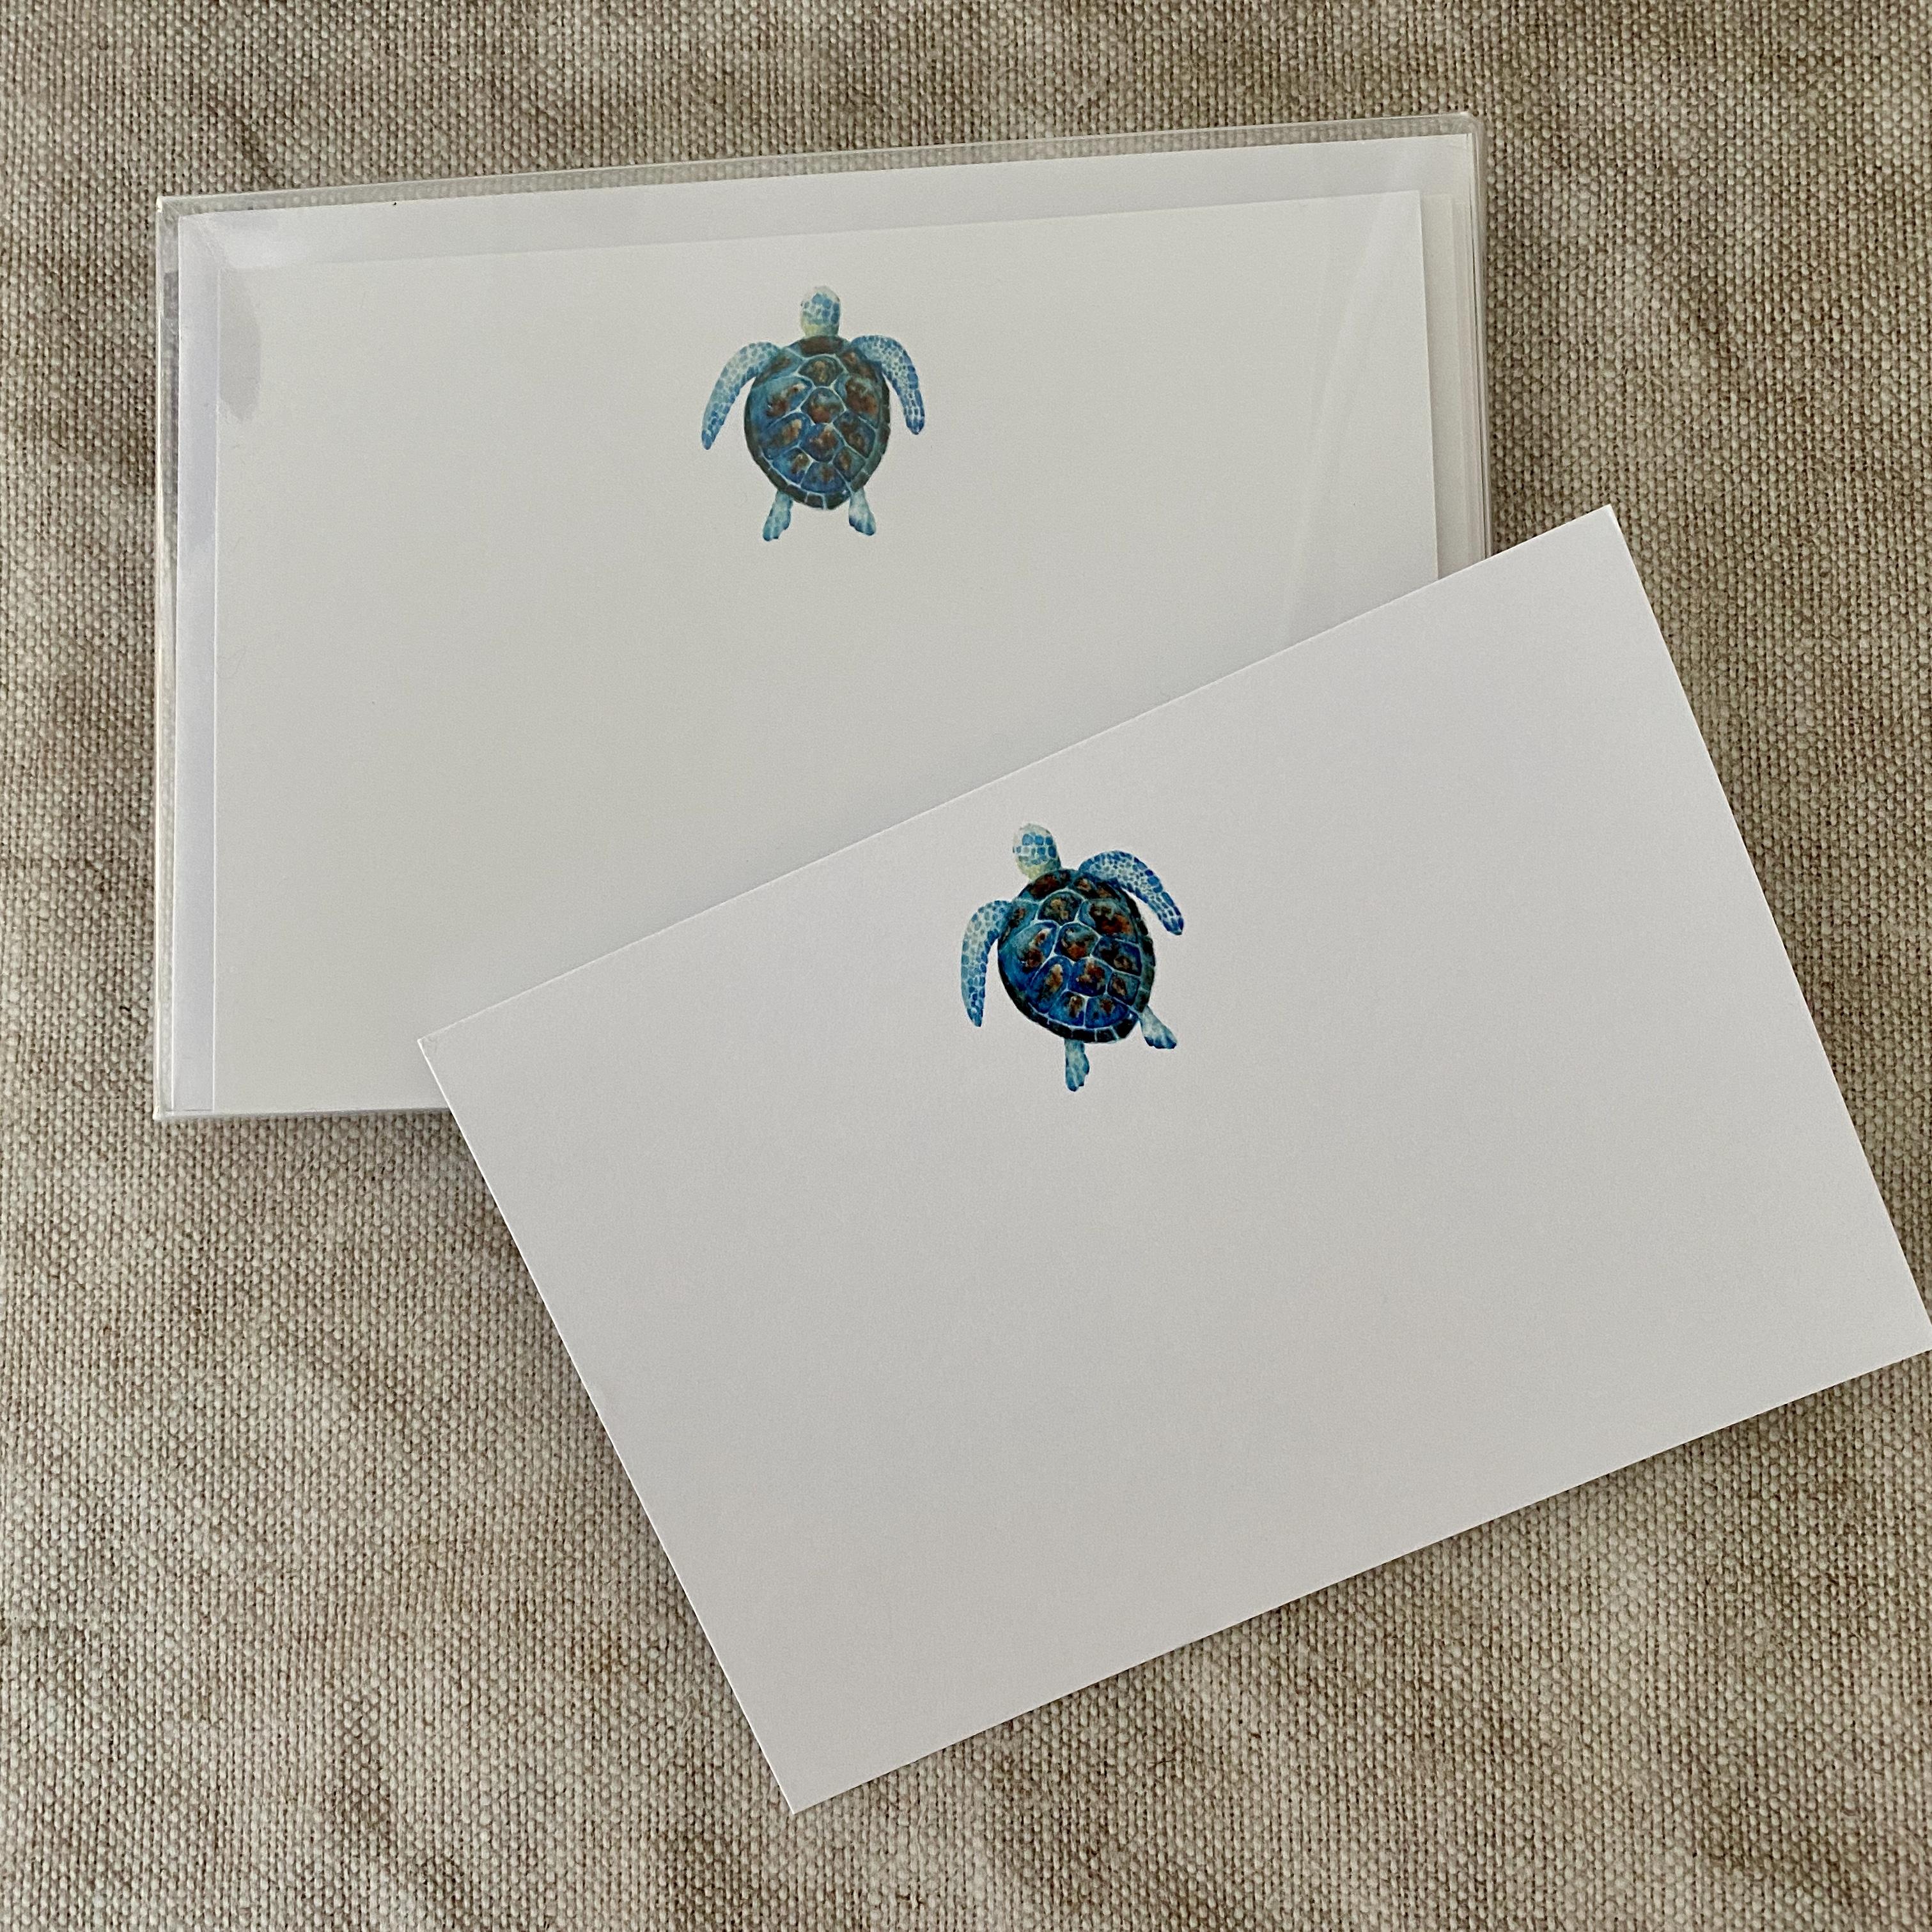 Sea Turtle Correspondence Cards